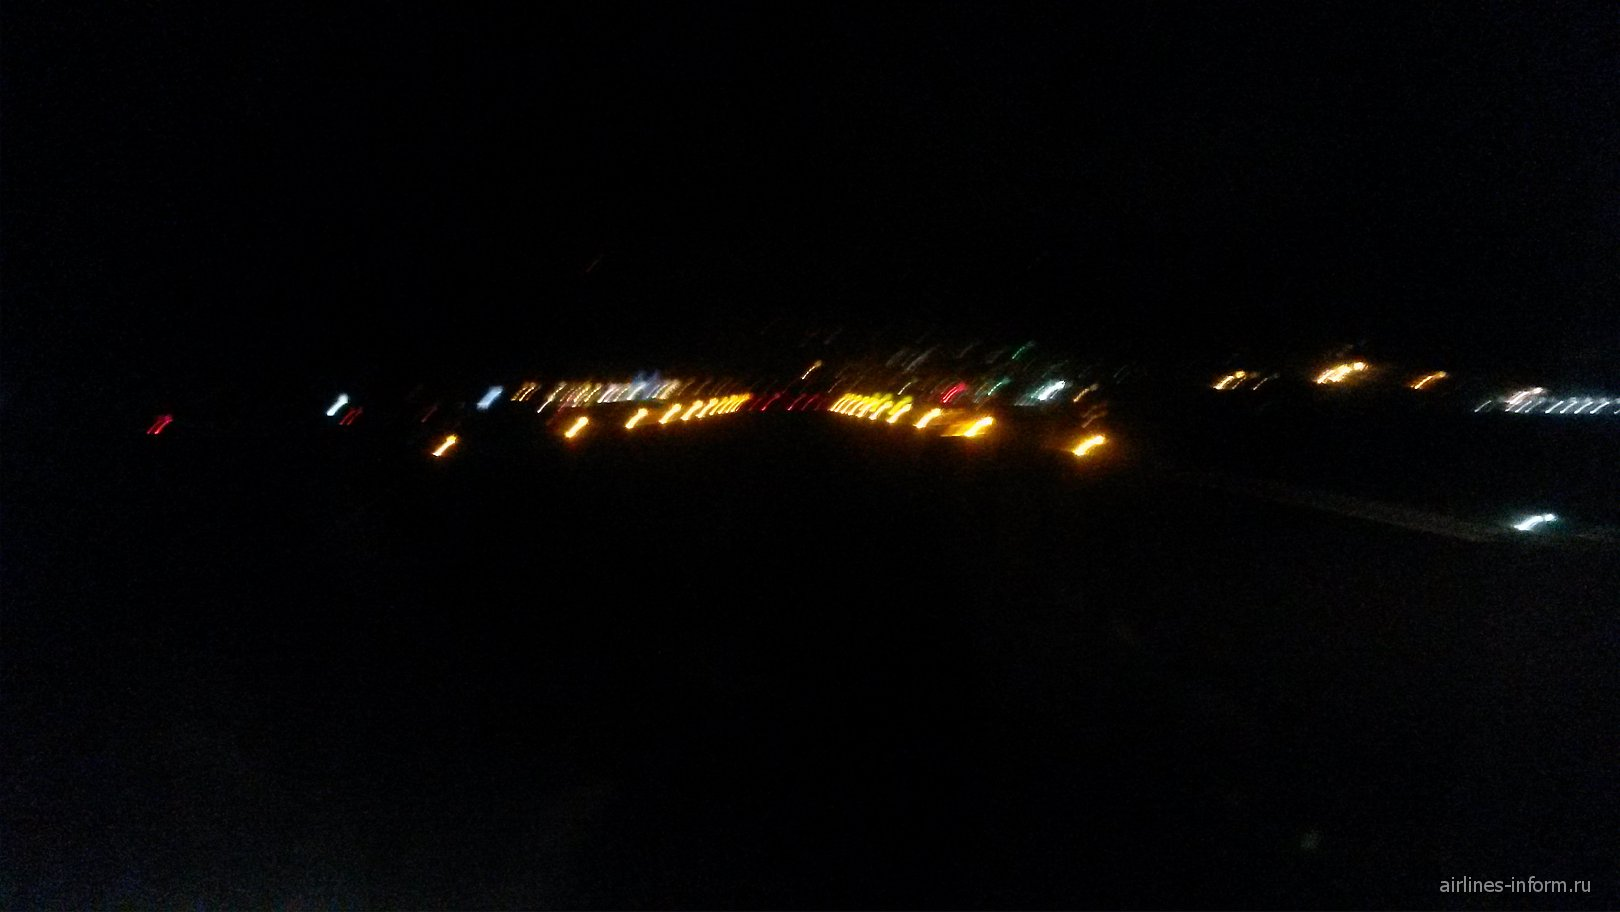 Аэропорт Сен-Мартен